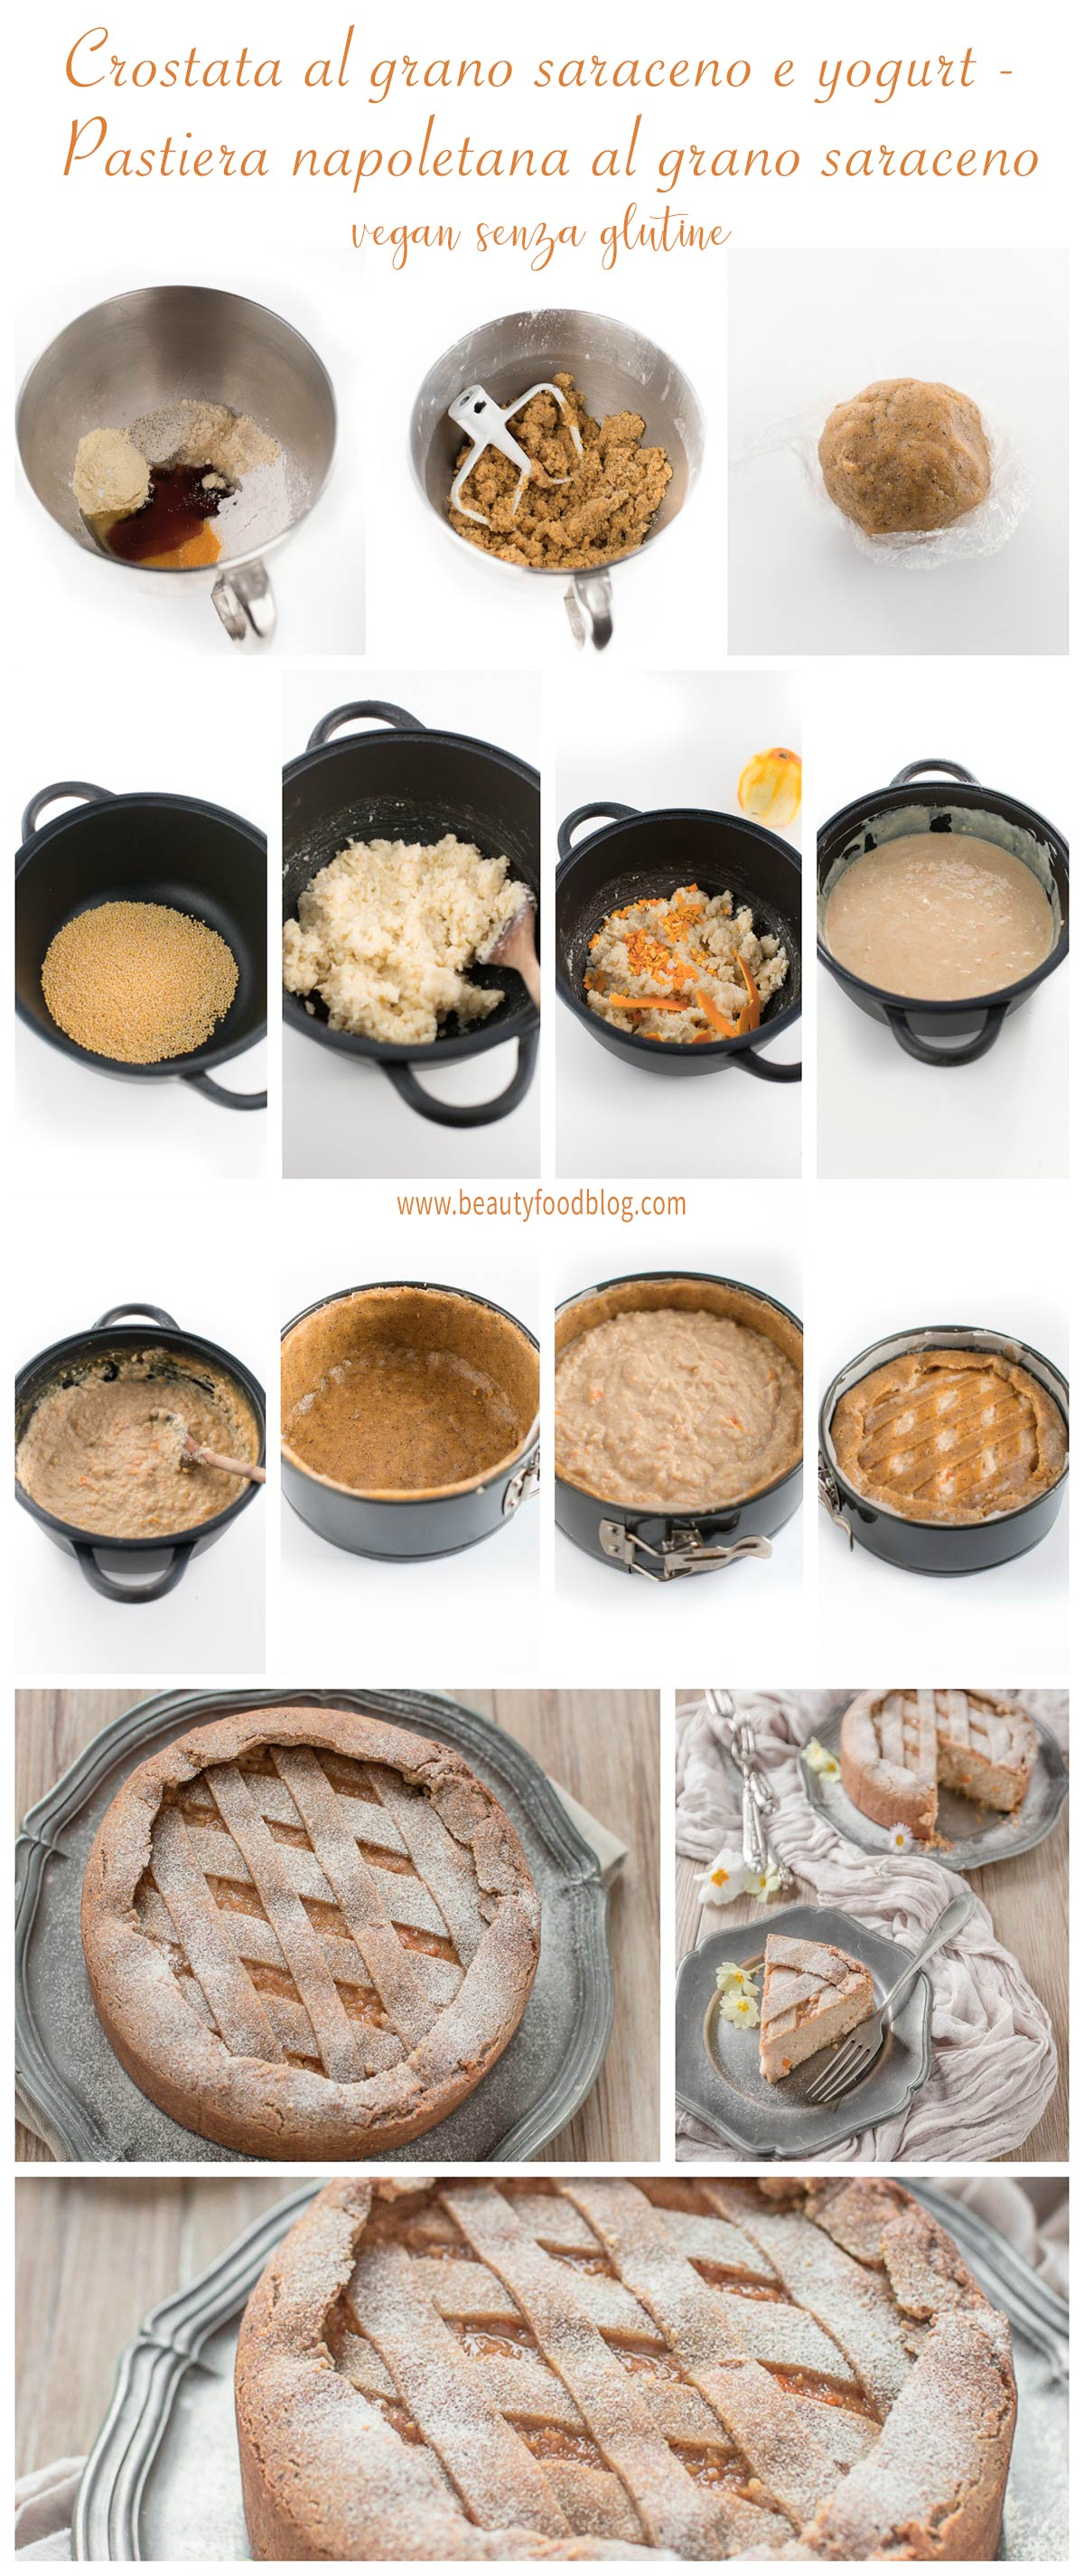 come preprare la pastiera napoletana vegan senza glutine crostata vegan senza glutine al grano saraceno e yogurt vegan buckwheat yogurt tart #glutenfree with vanilla and millet.jpg